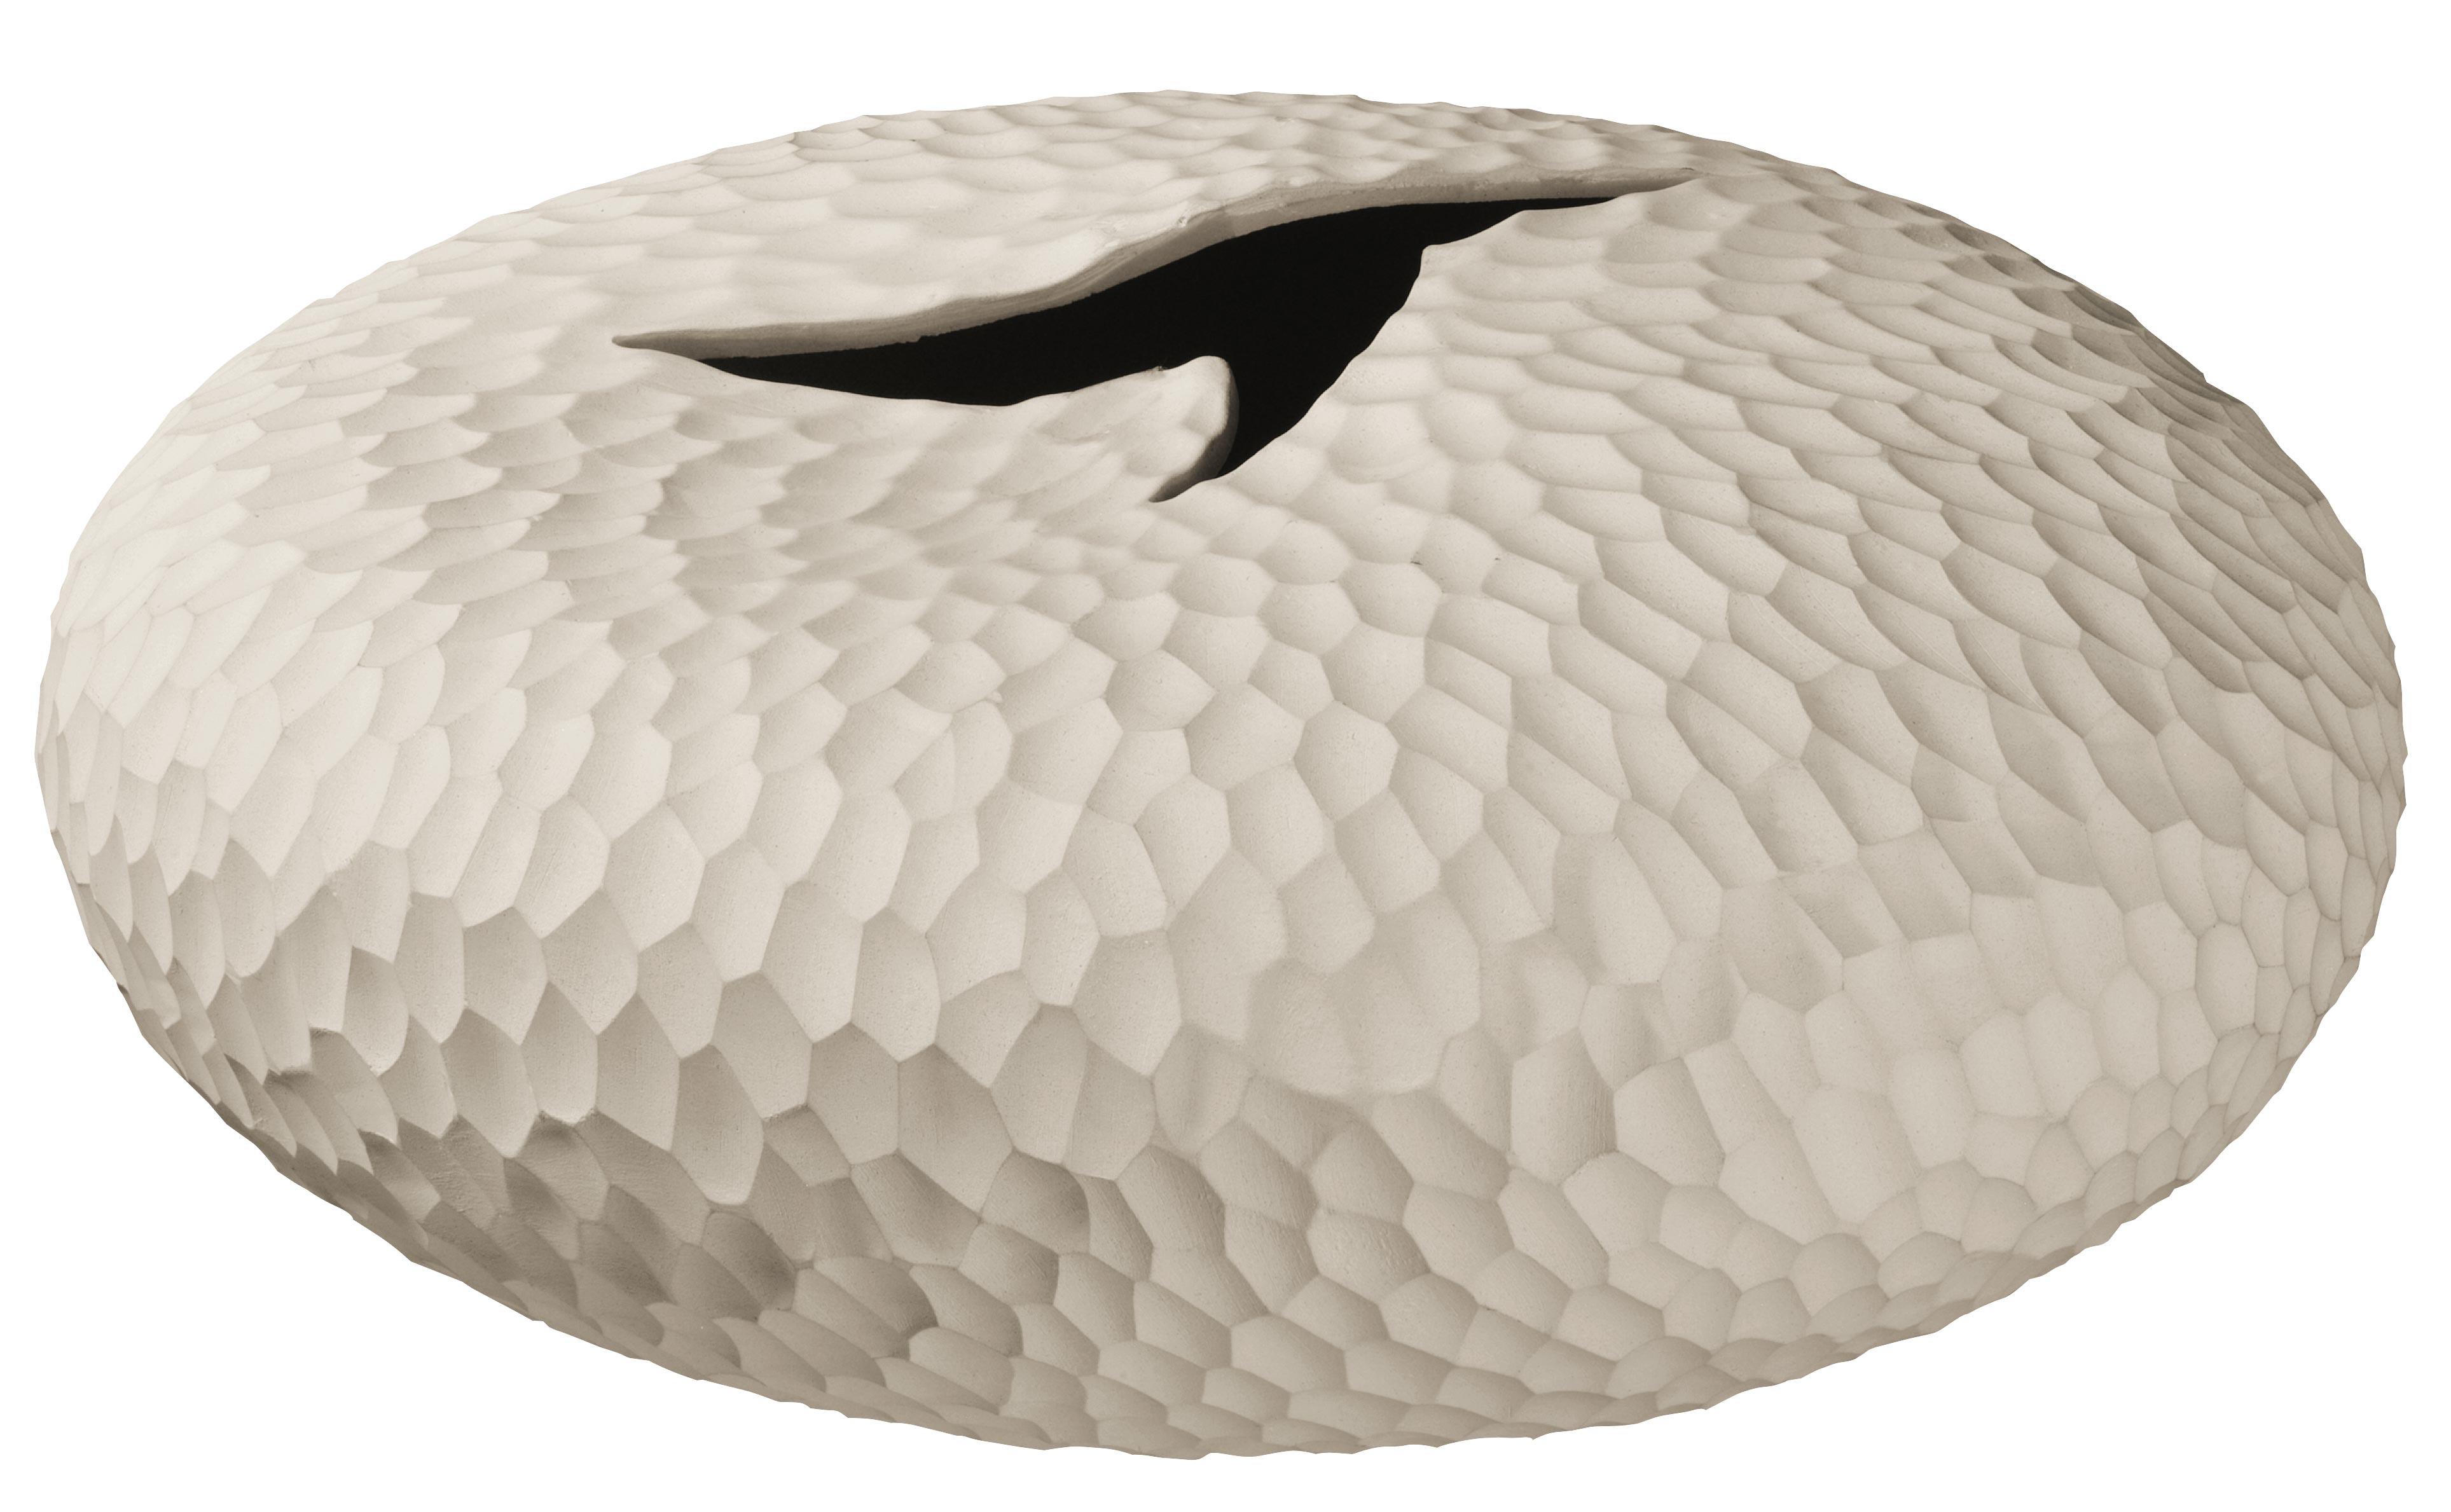 vase natur carve serien home by asa die asa. Black Bedroom Furniture Sets. Home Design Ideas